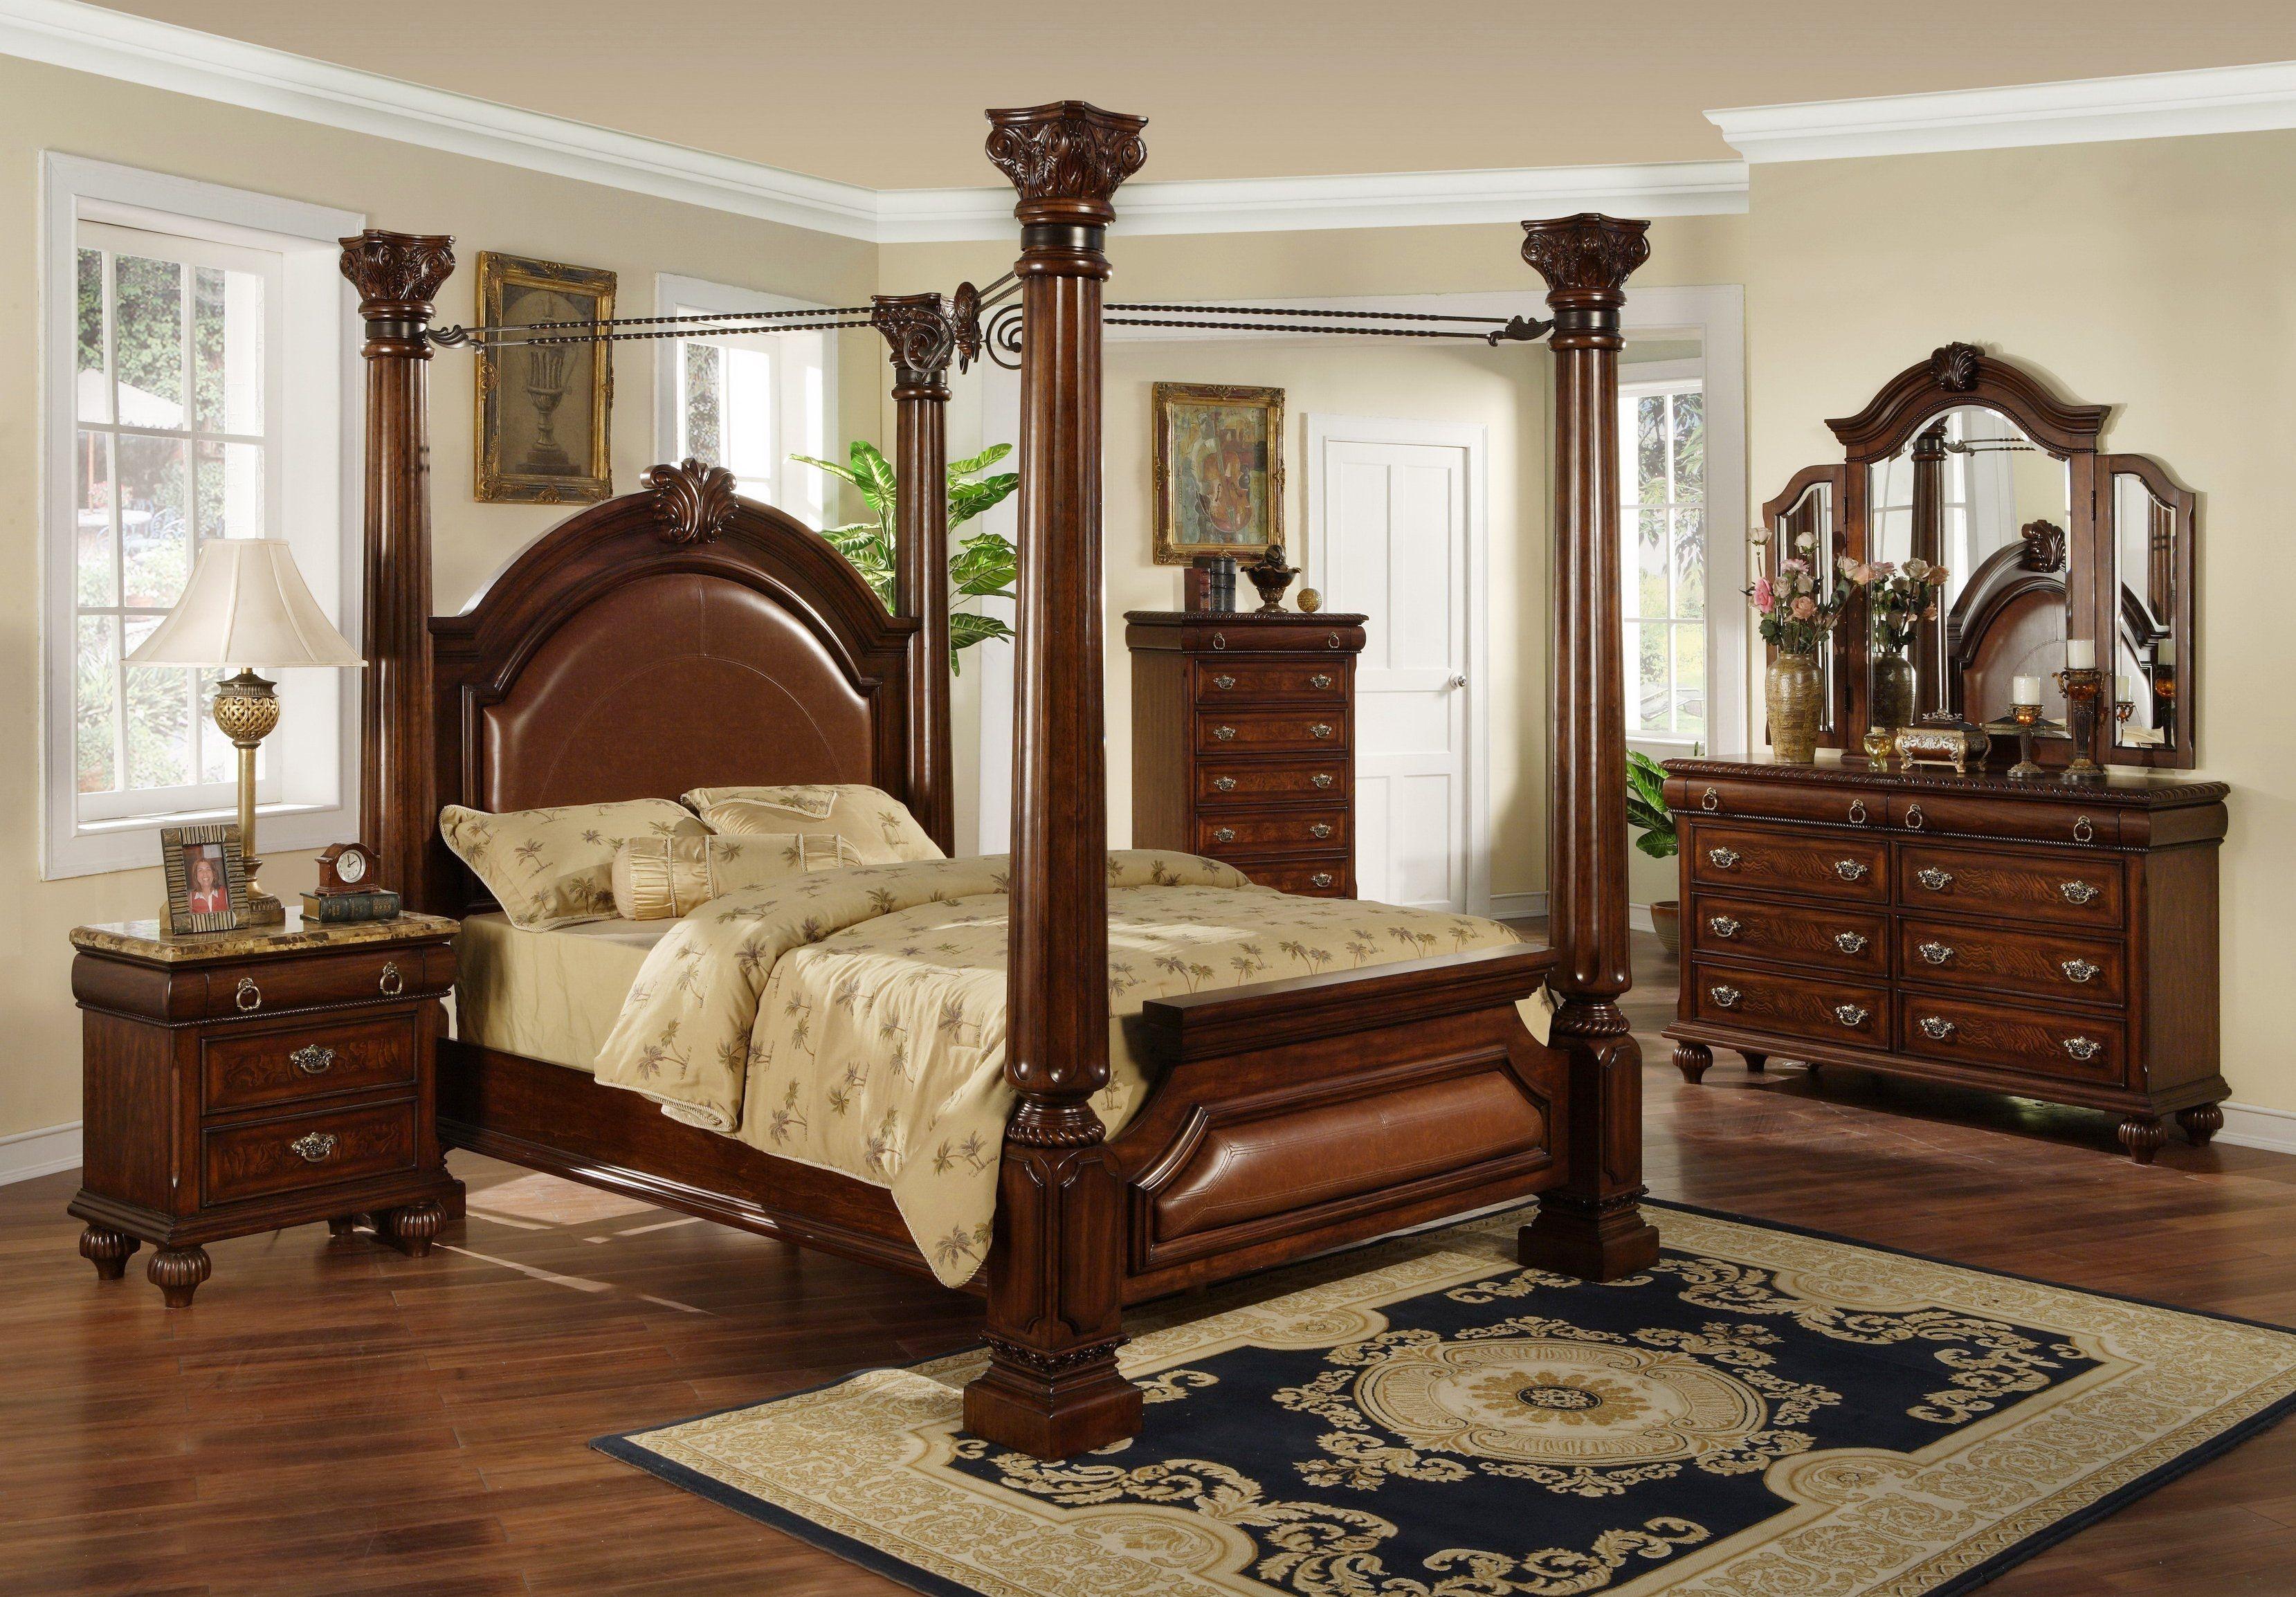 image modern bedroom furniture sets mahogany. Solid Mahogany Wood Bedroom Furniture Sets Image Modern Bedroom Furniture Sets Mahogany O